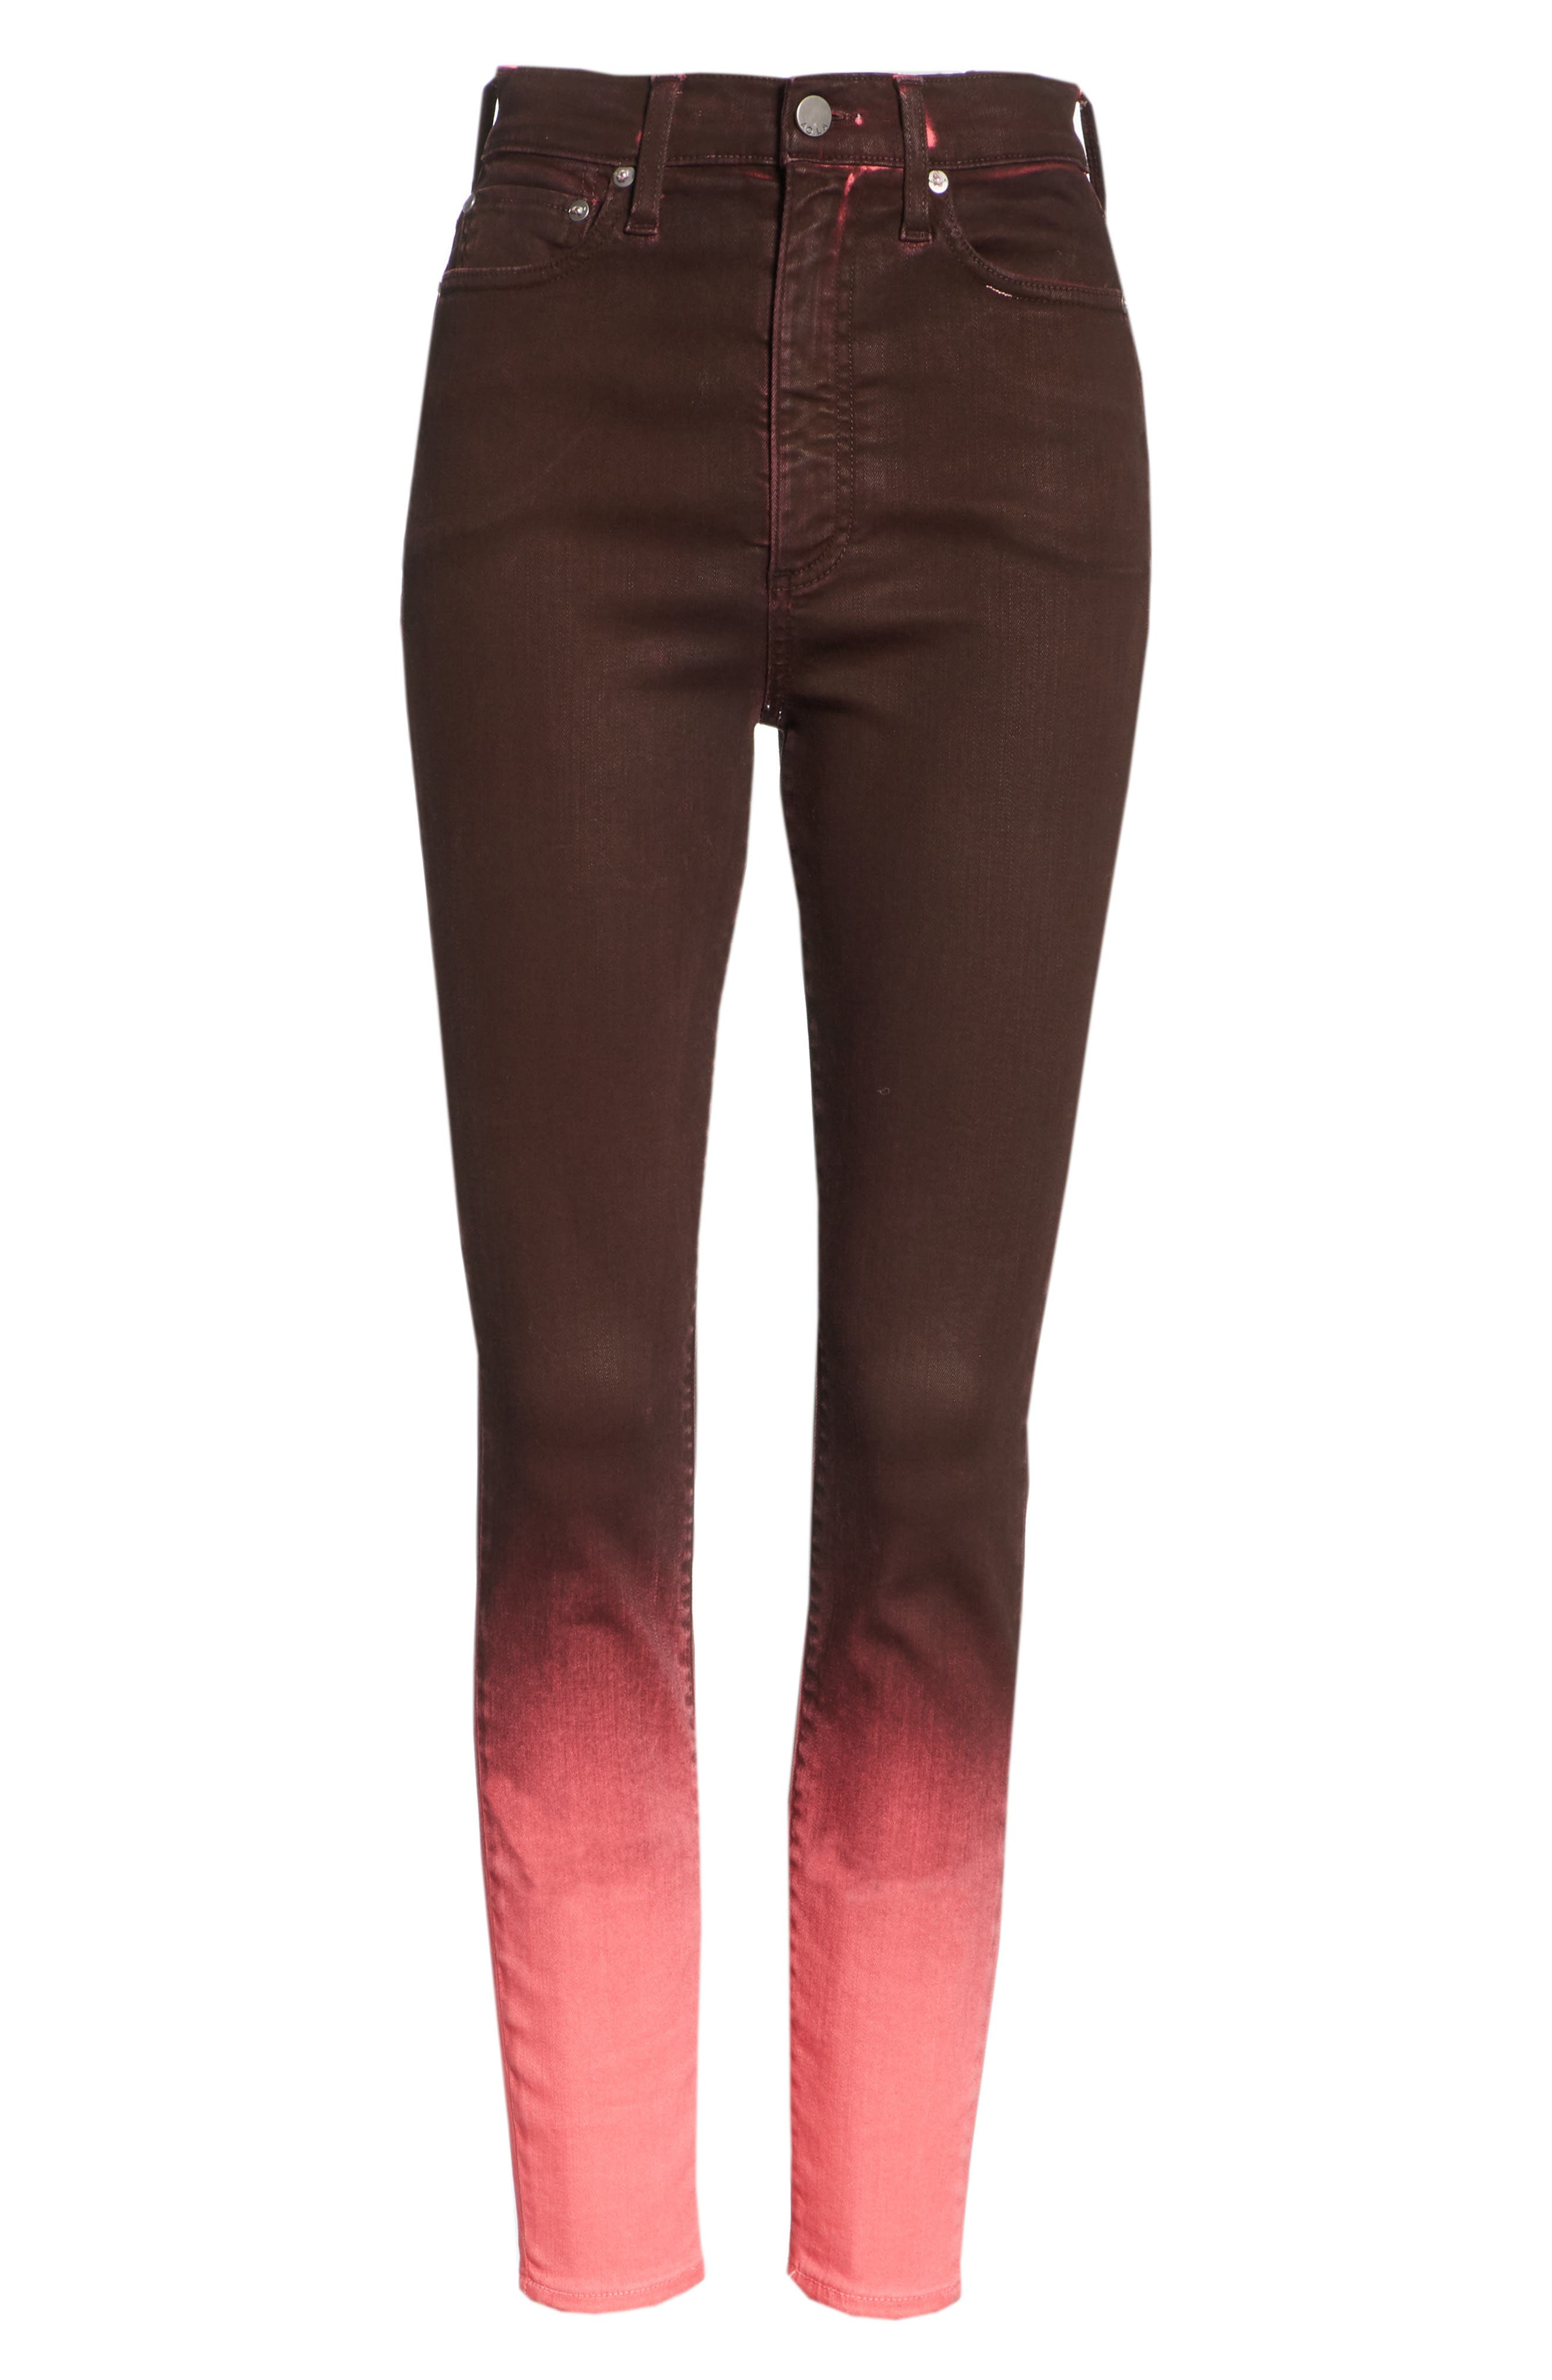 AO.LA Good High Waist Ankle Skinny Jeans,                             Alternate thumbnail 6, color,                             WINE/ BUBBLEGUM